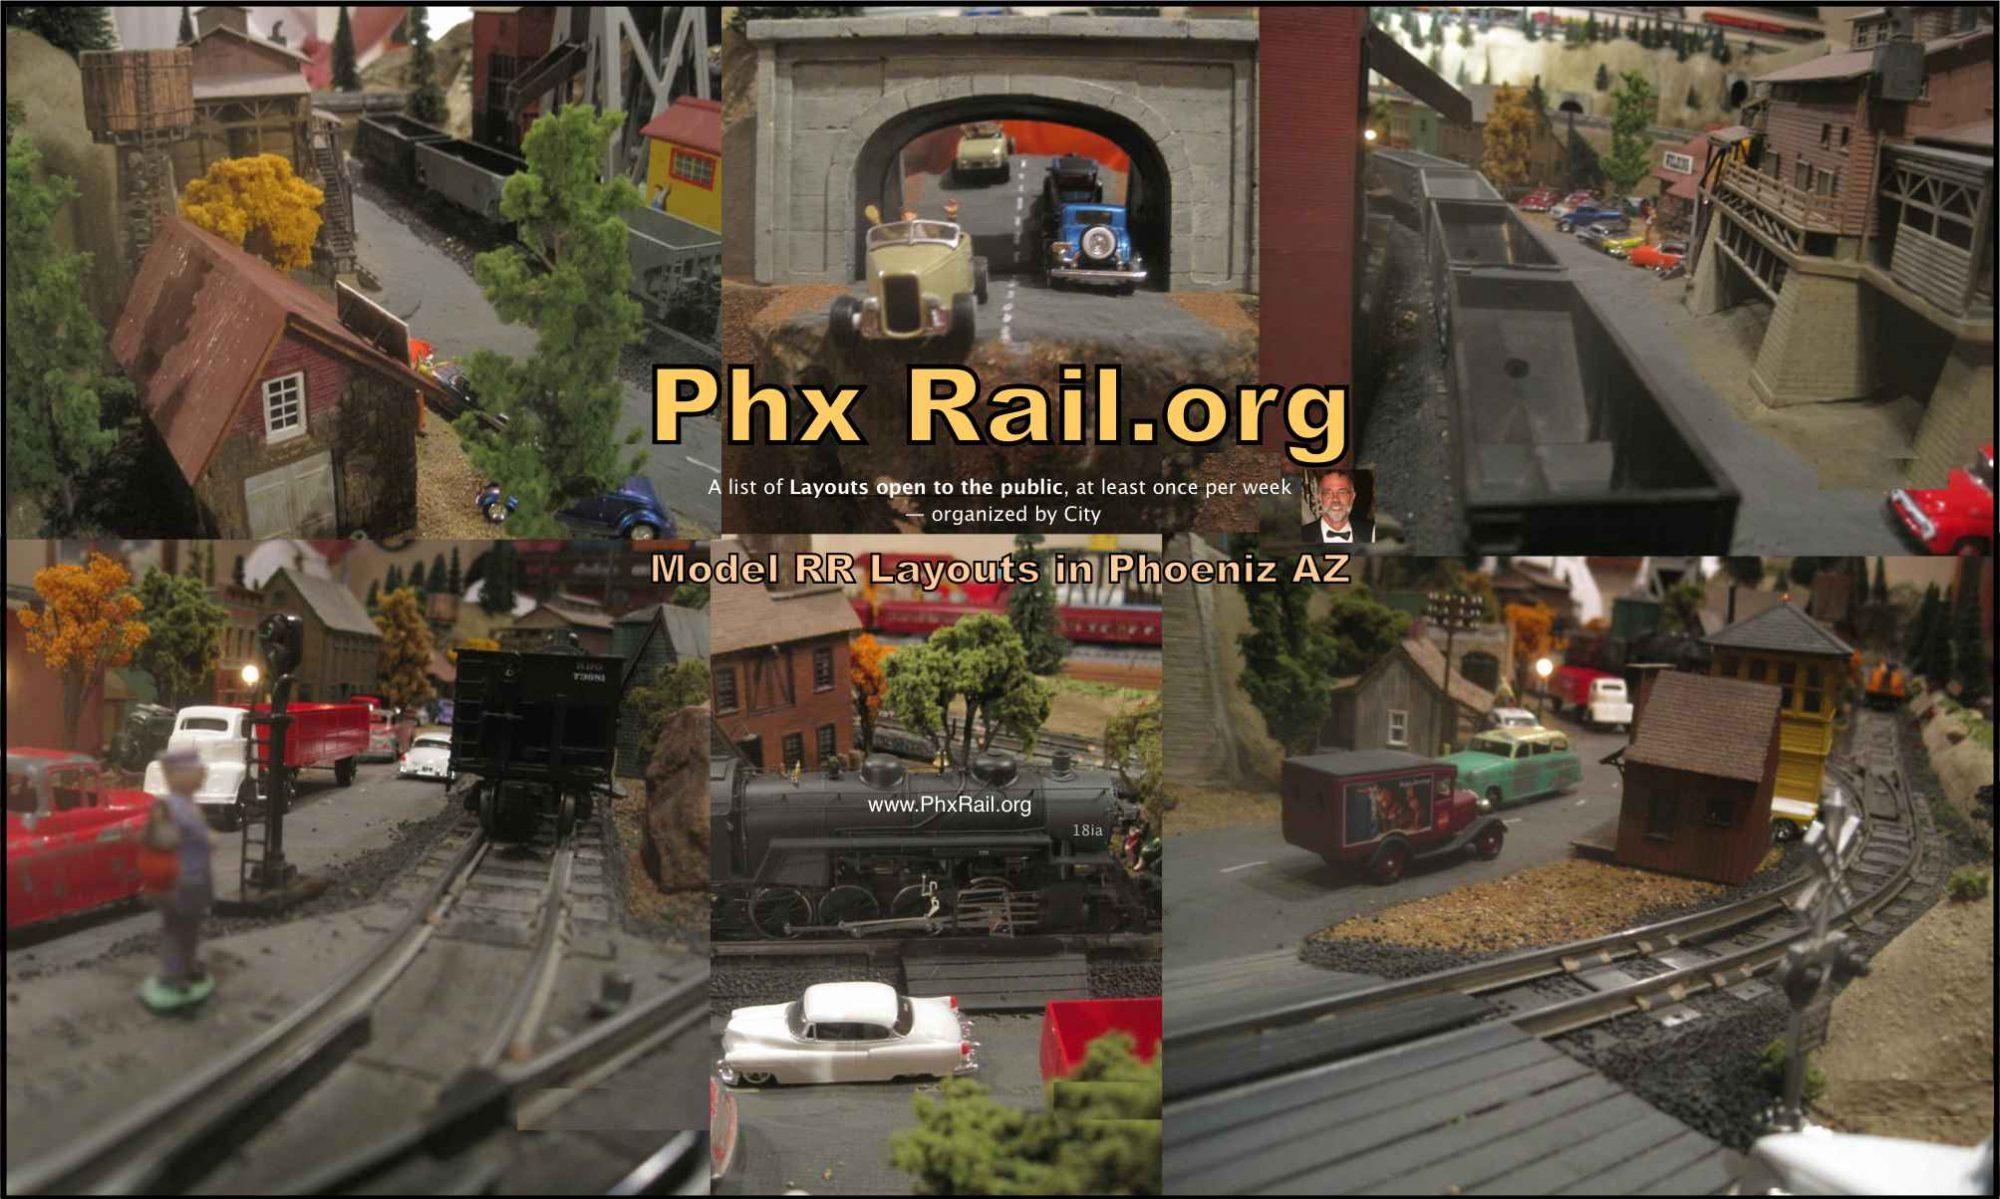 PhxRail.org